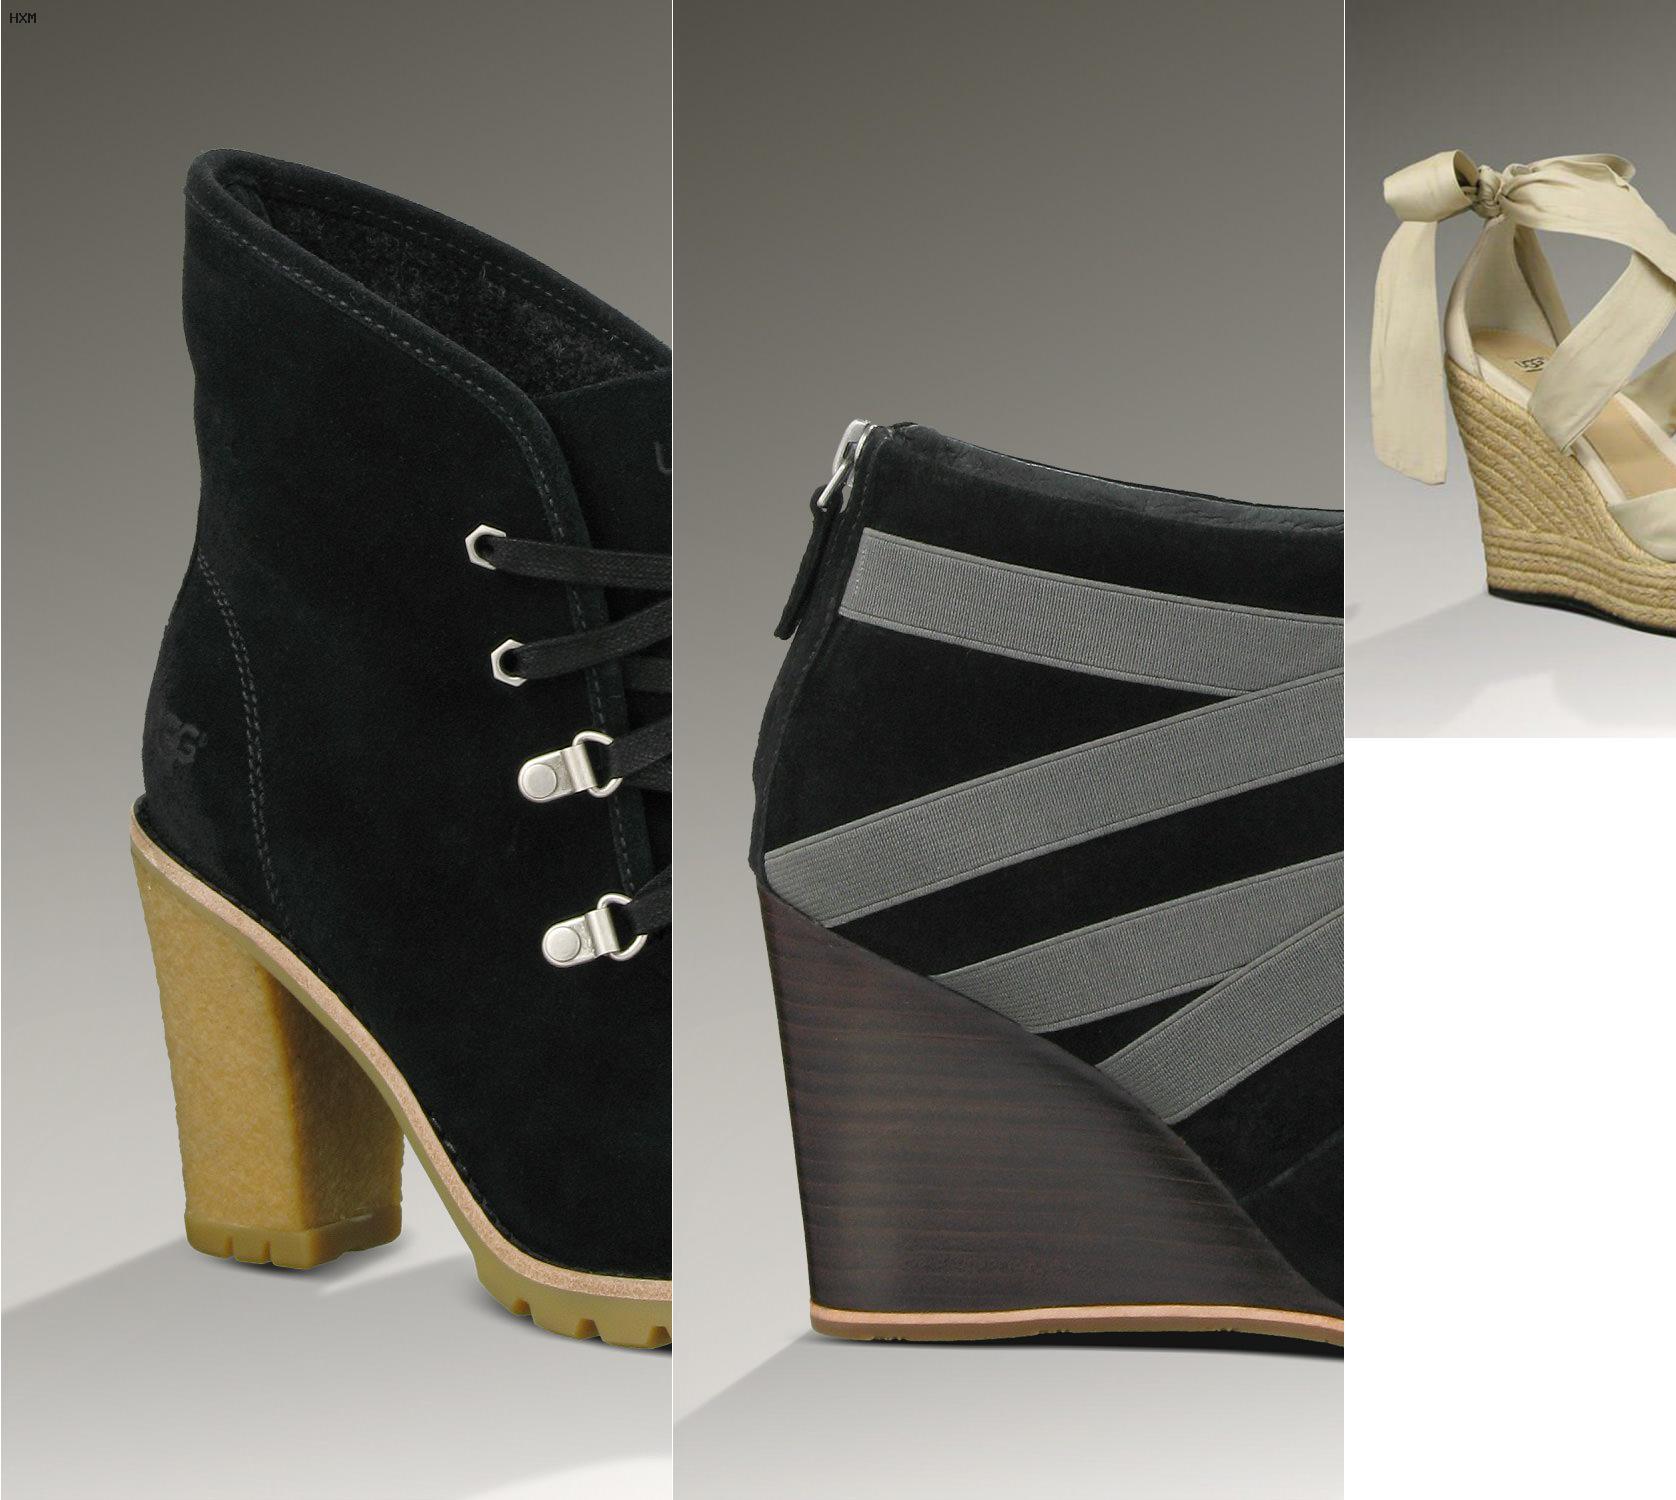 scarpe ugg negozi a milano